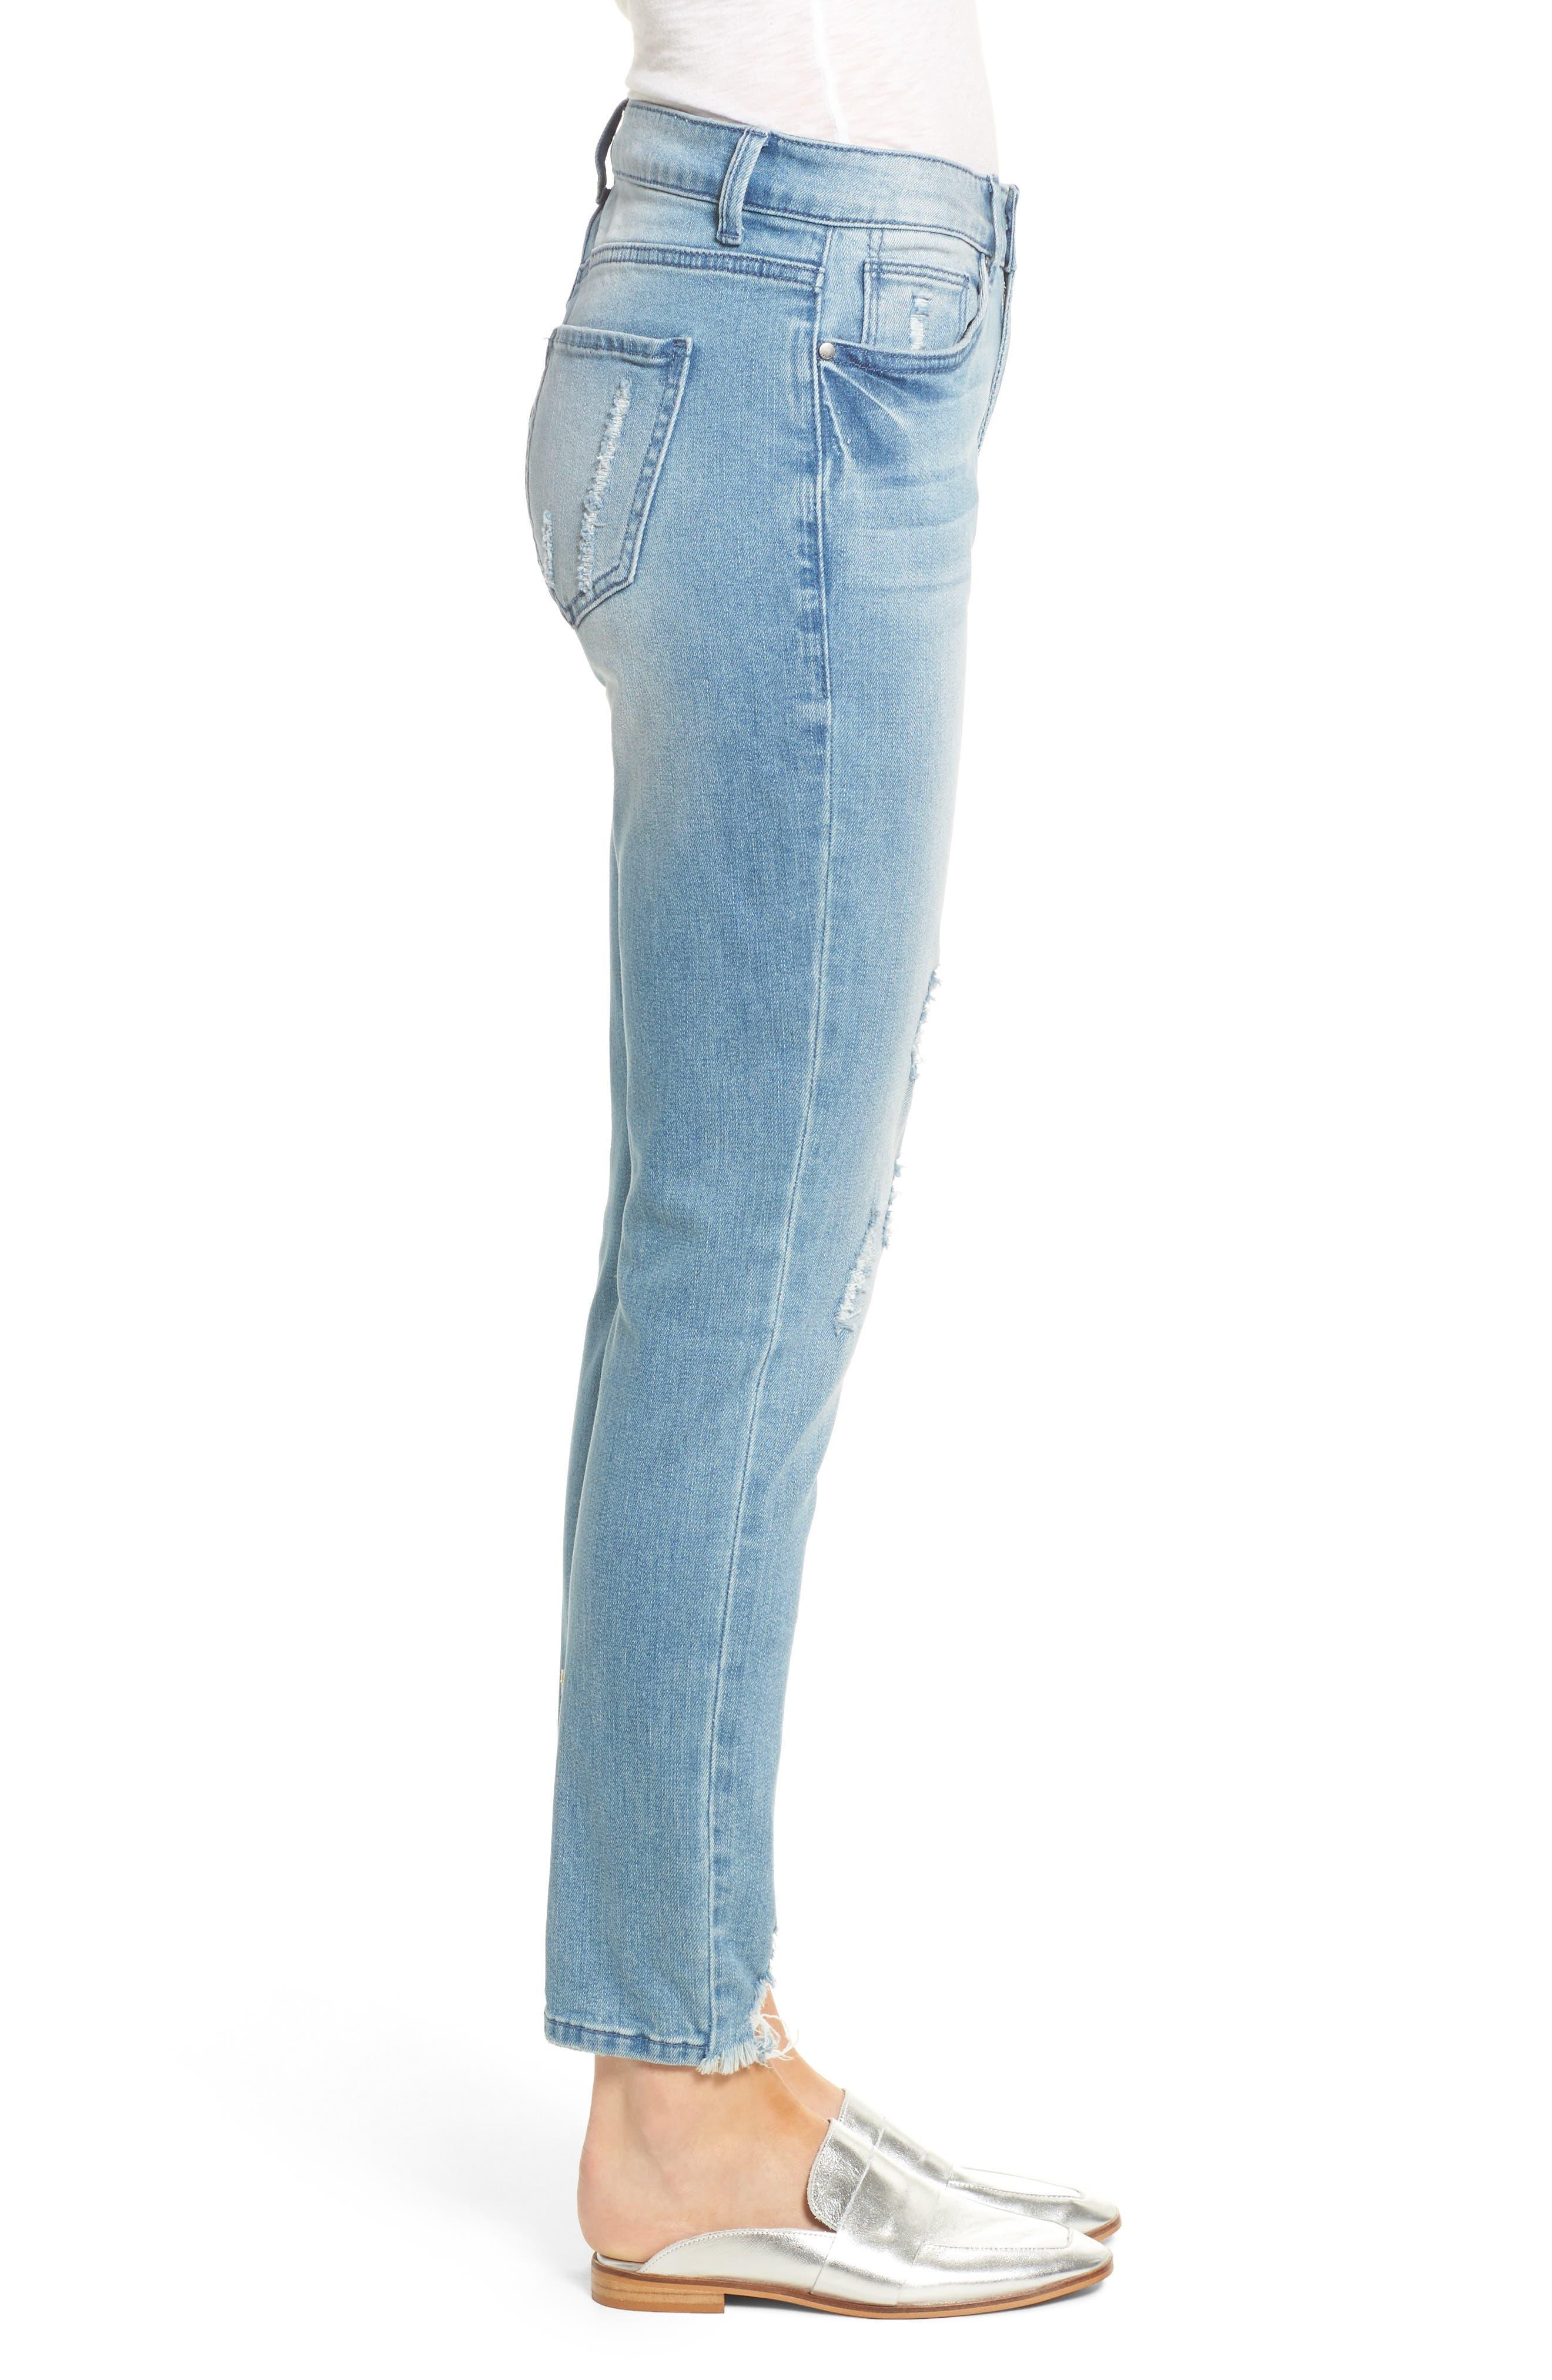 Verona Skinny Jeans,                             Alternate thumbnail 3, color,                             403